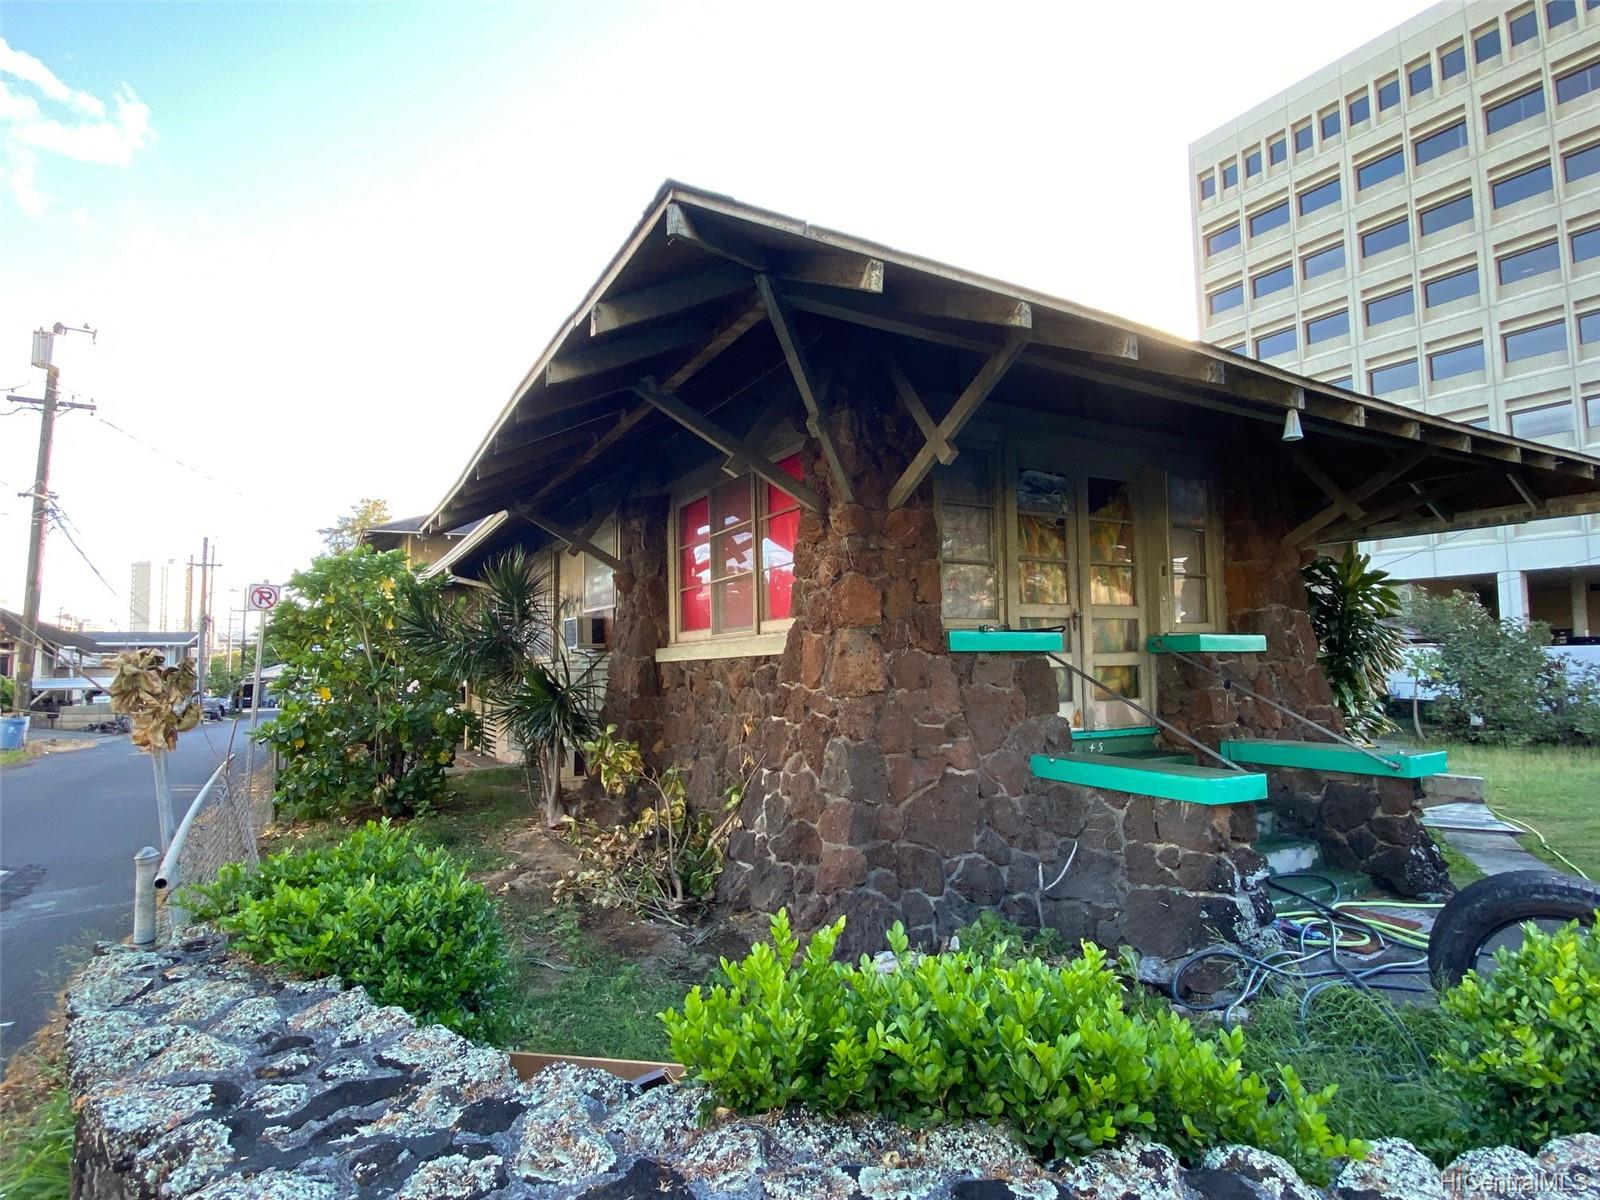 245 Kuakini Street Honolulu - Multi-family - photo 6 of 6